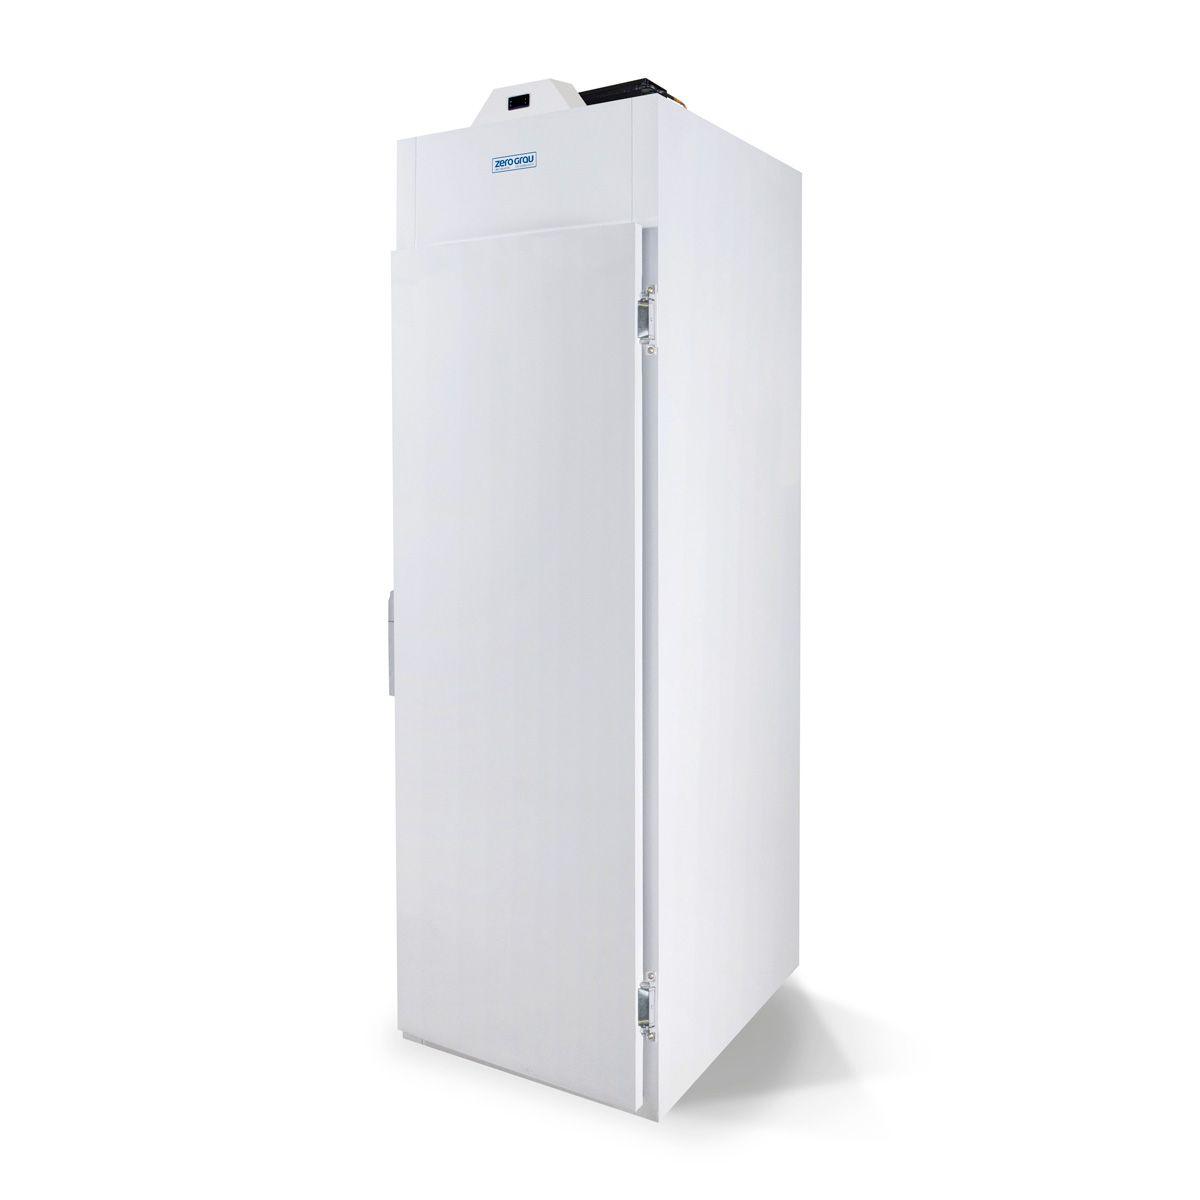 Freezer 830 Litros